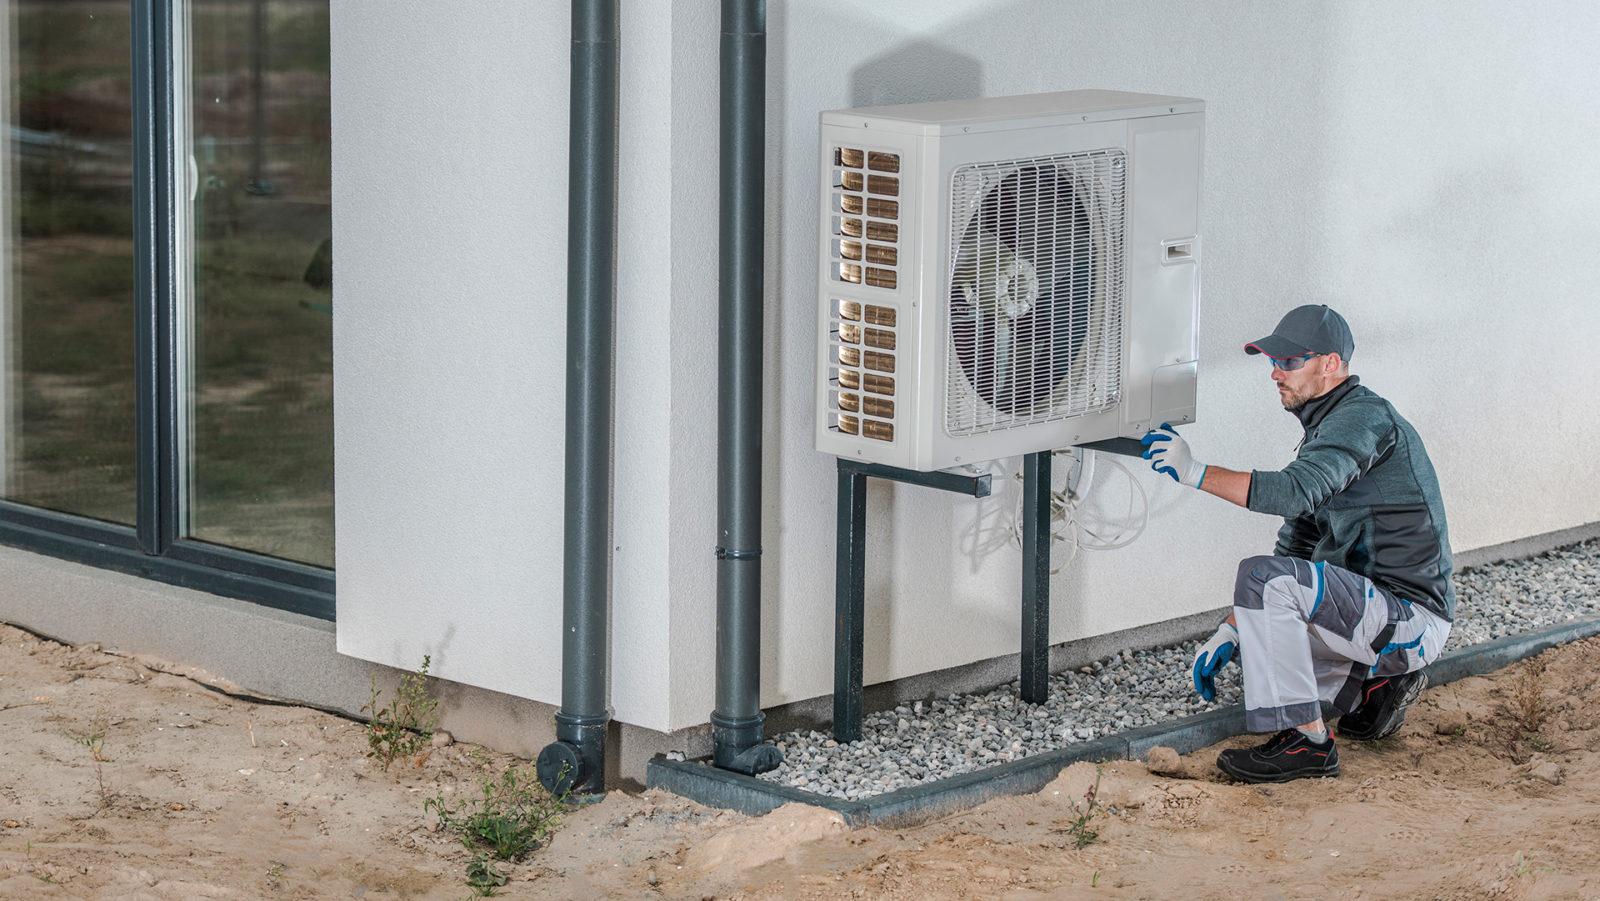 cv koeltechniek installateur monteur